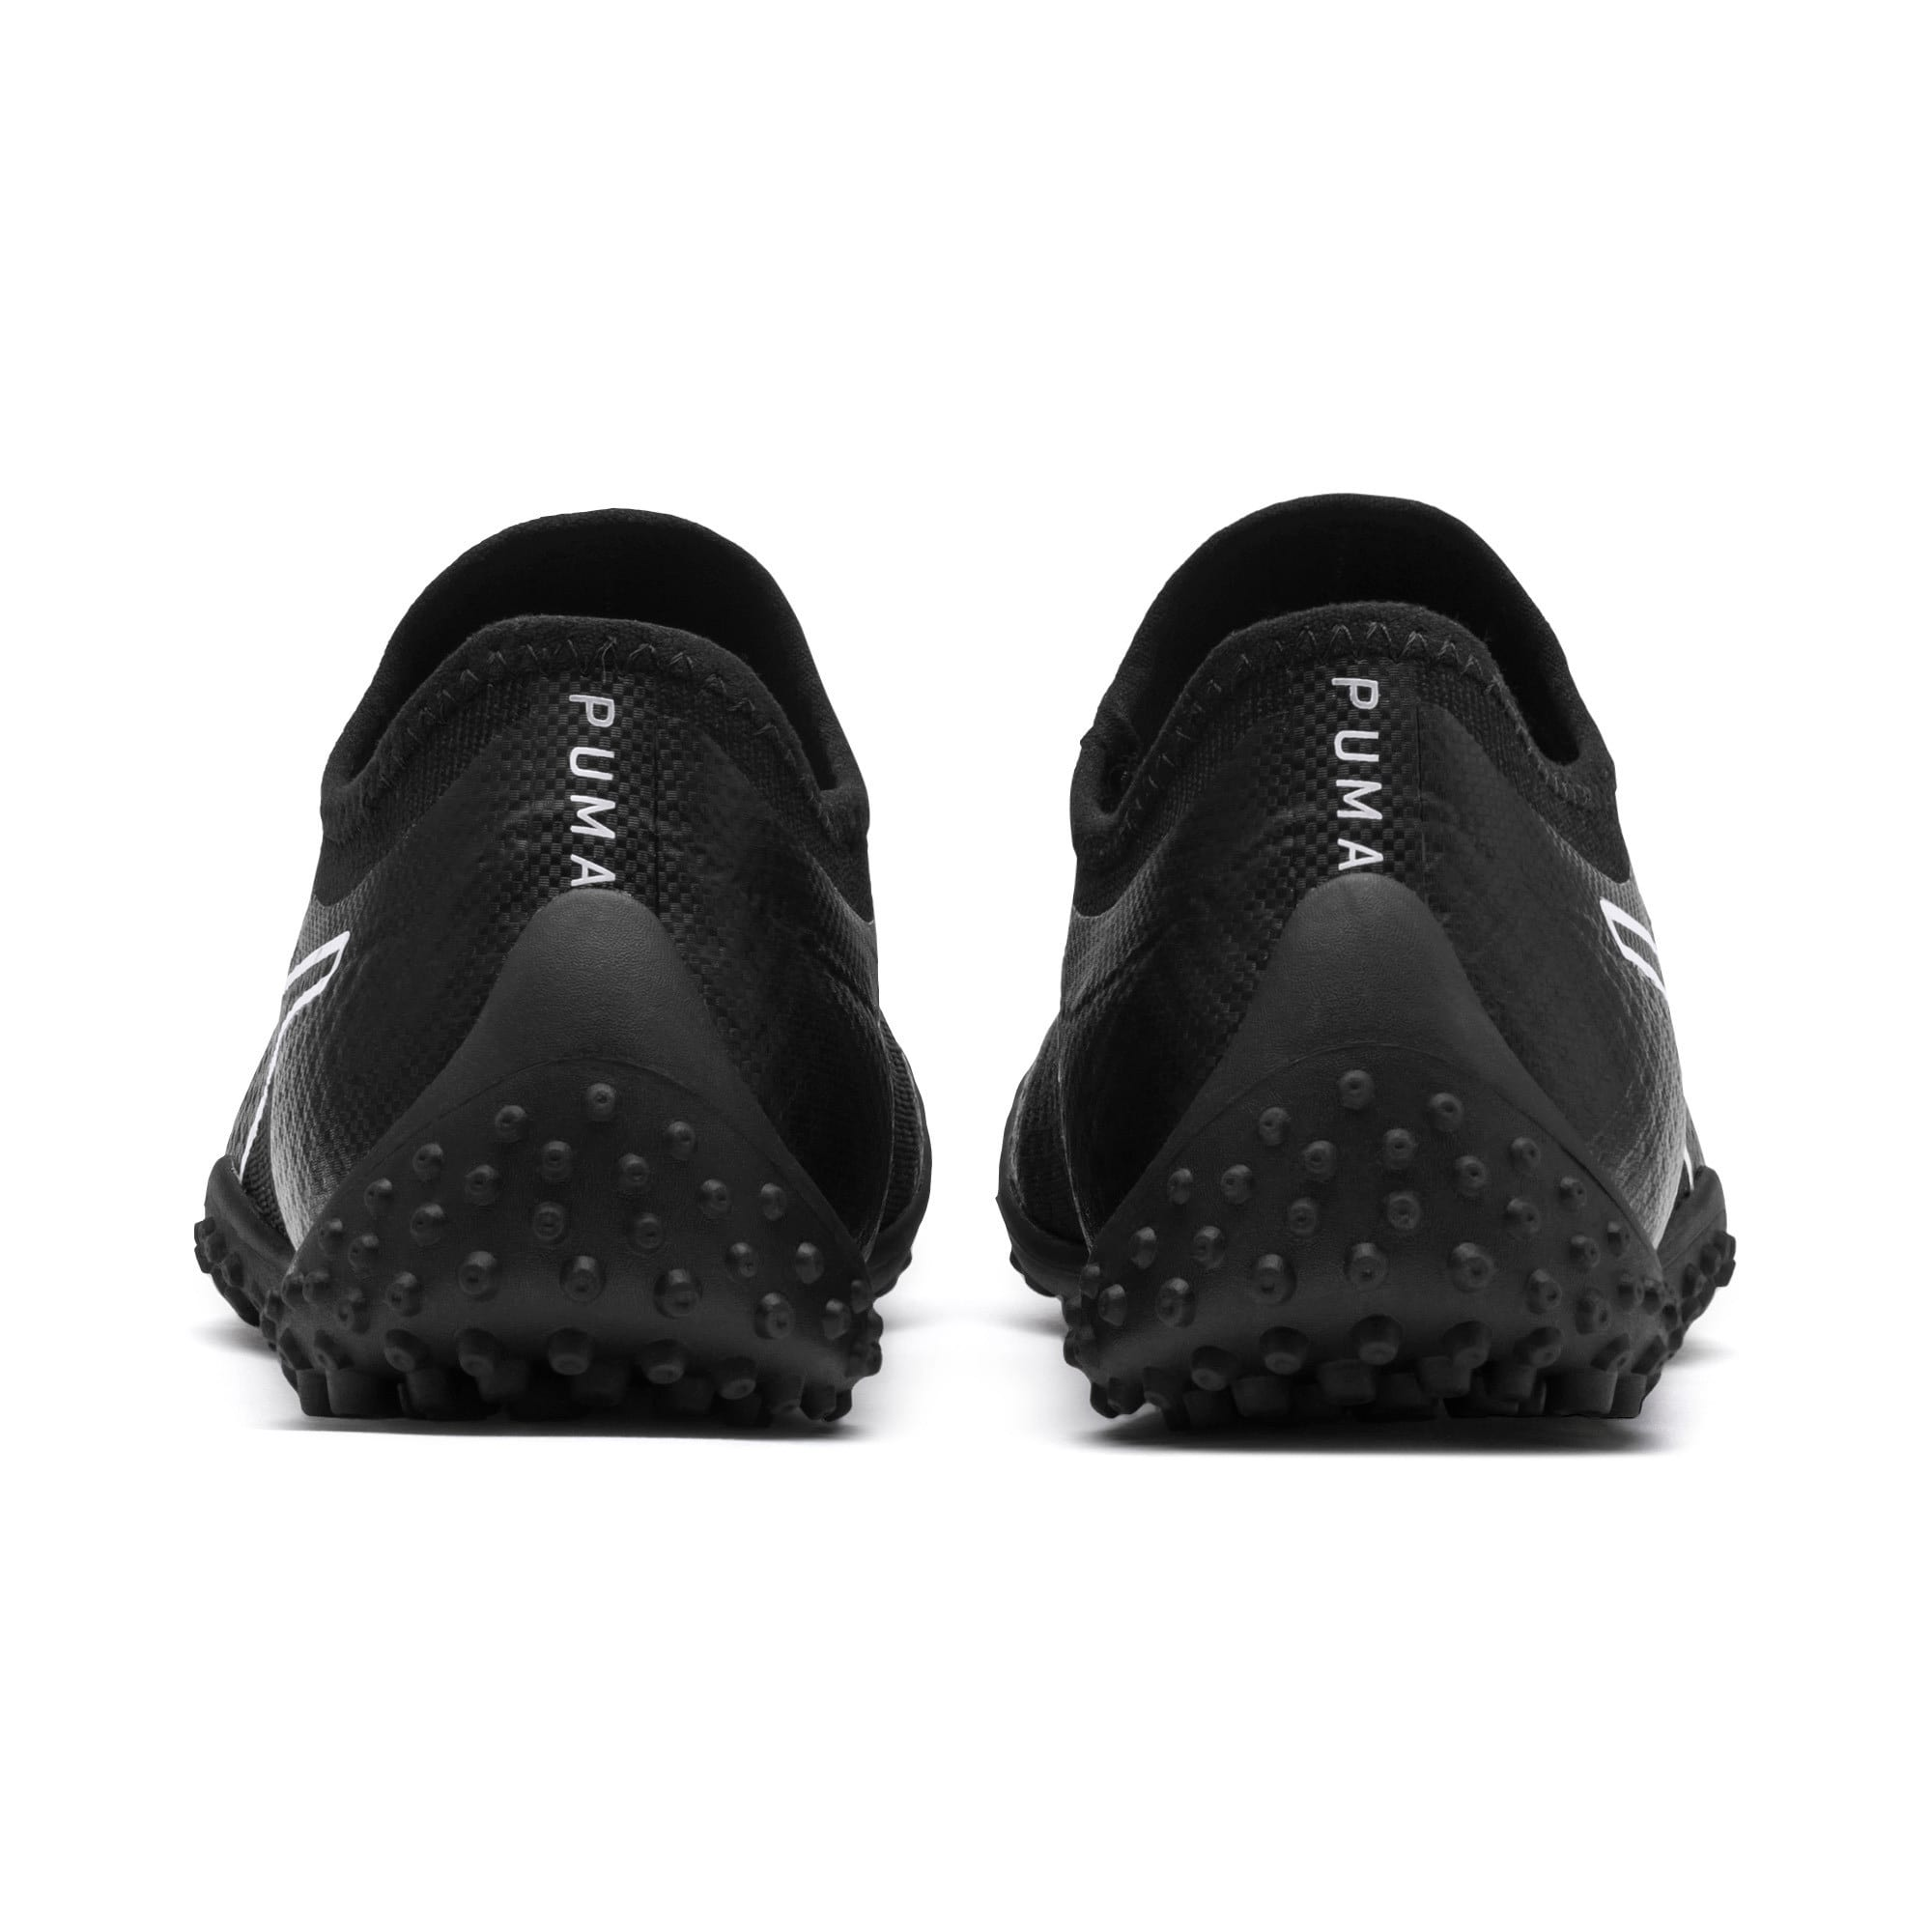 Thumbnail 4 of 365 Concrete 2 Men's Football Boots, Puma Black-Puma White, medium